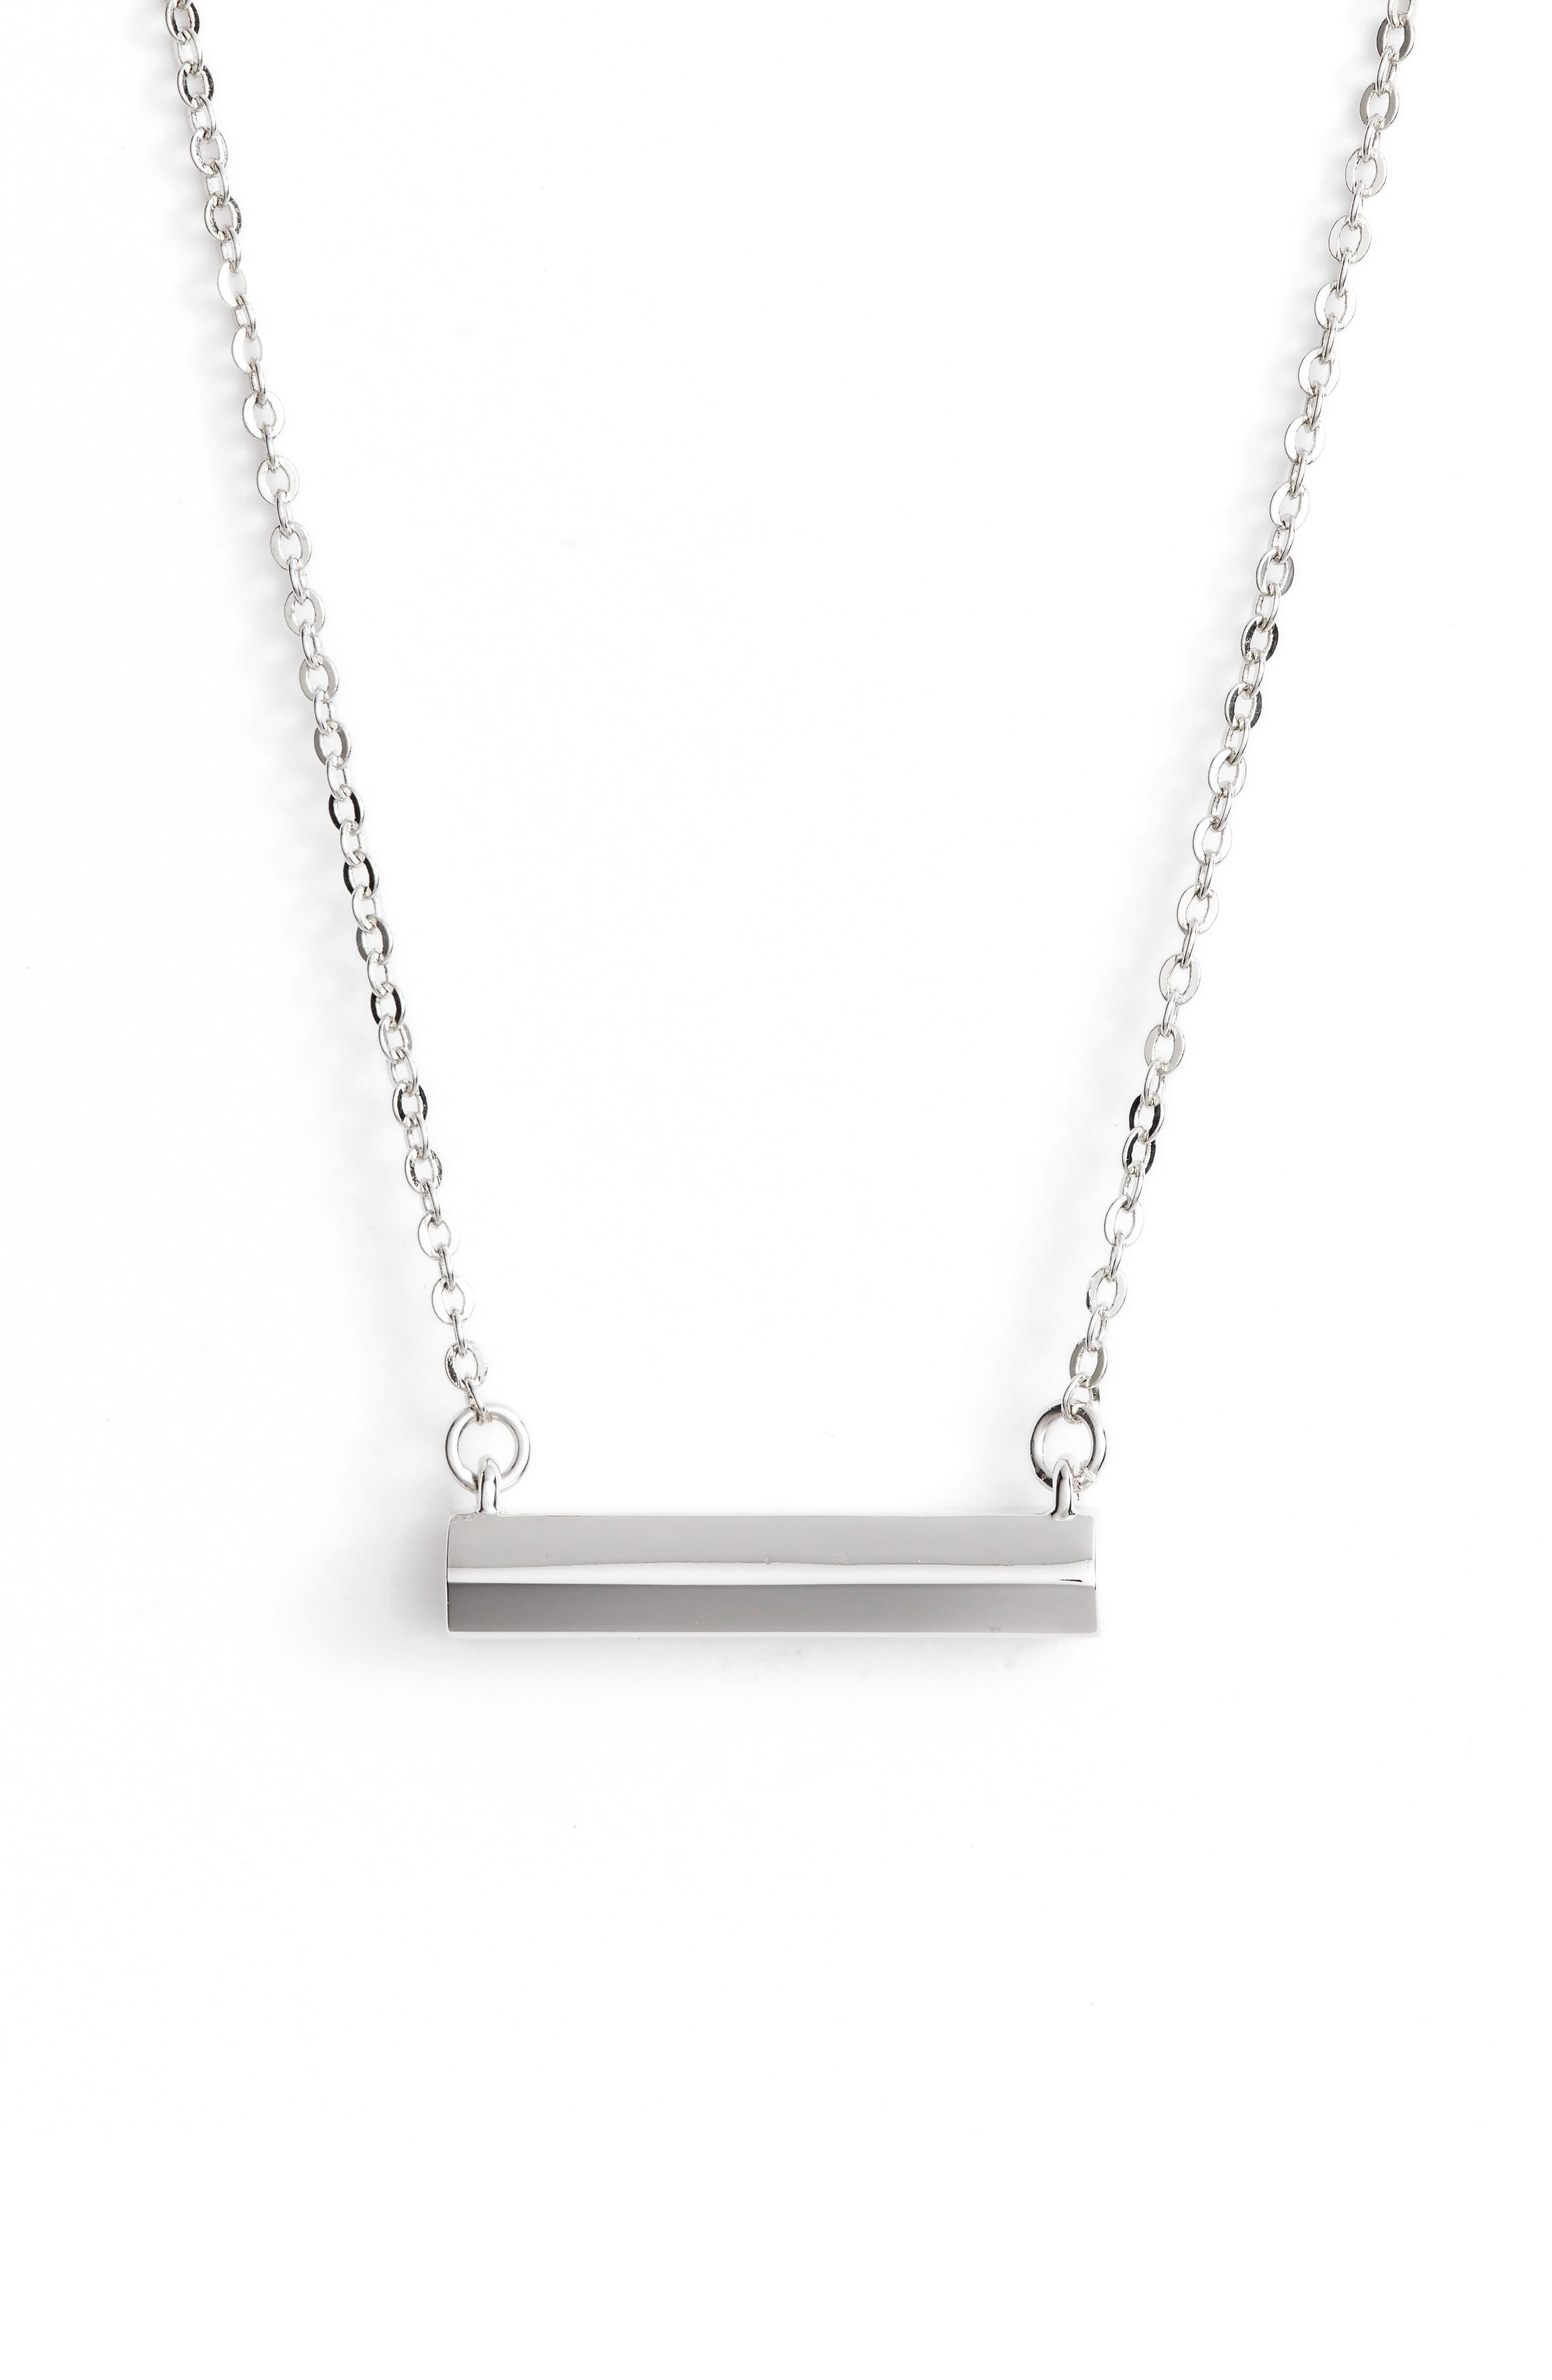 Hexagon Shaped Bar Pendant Necklace,                             Main thumbnail 1, color,                             040